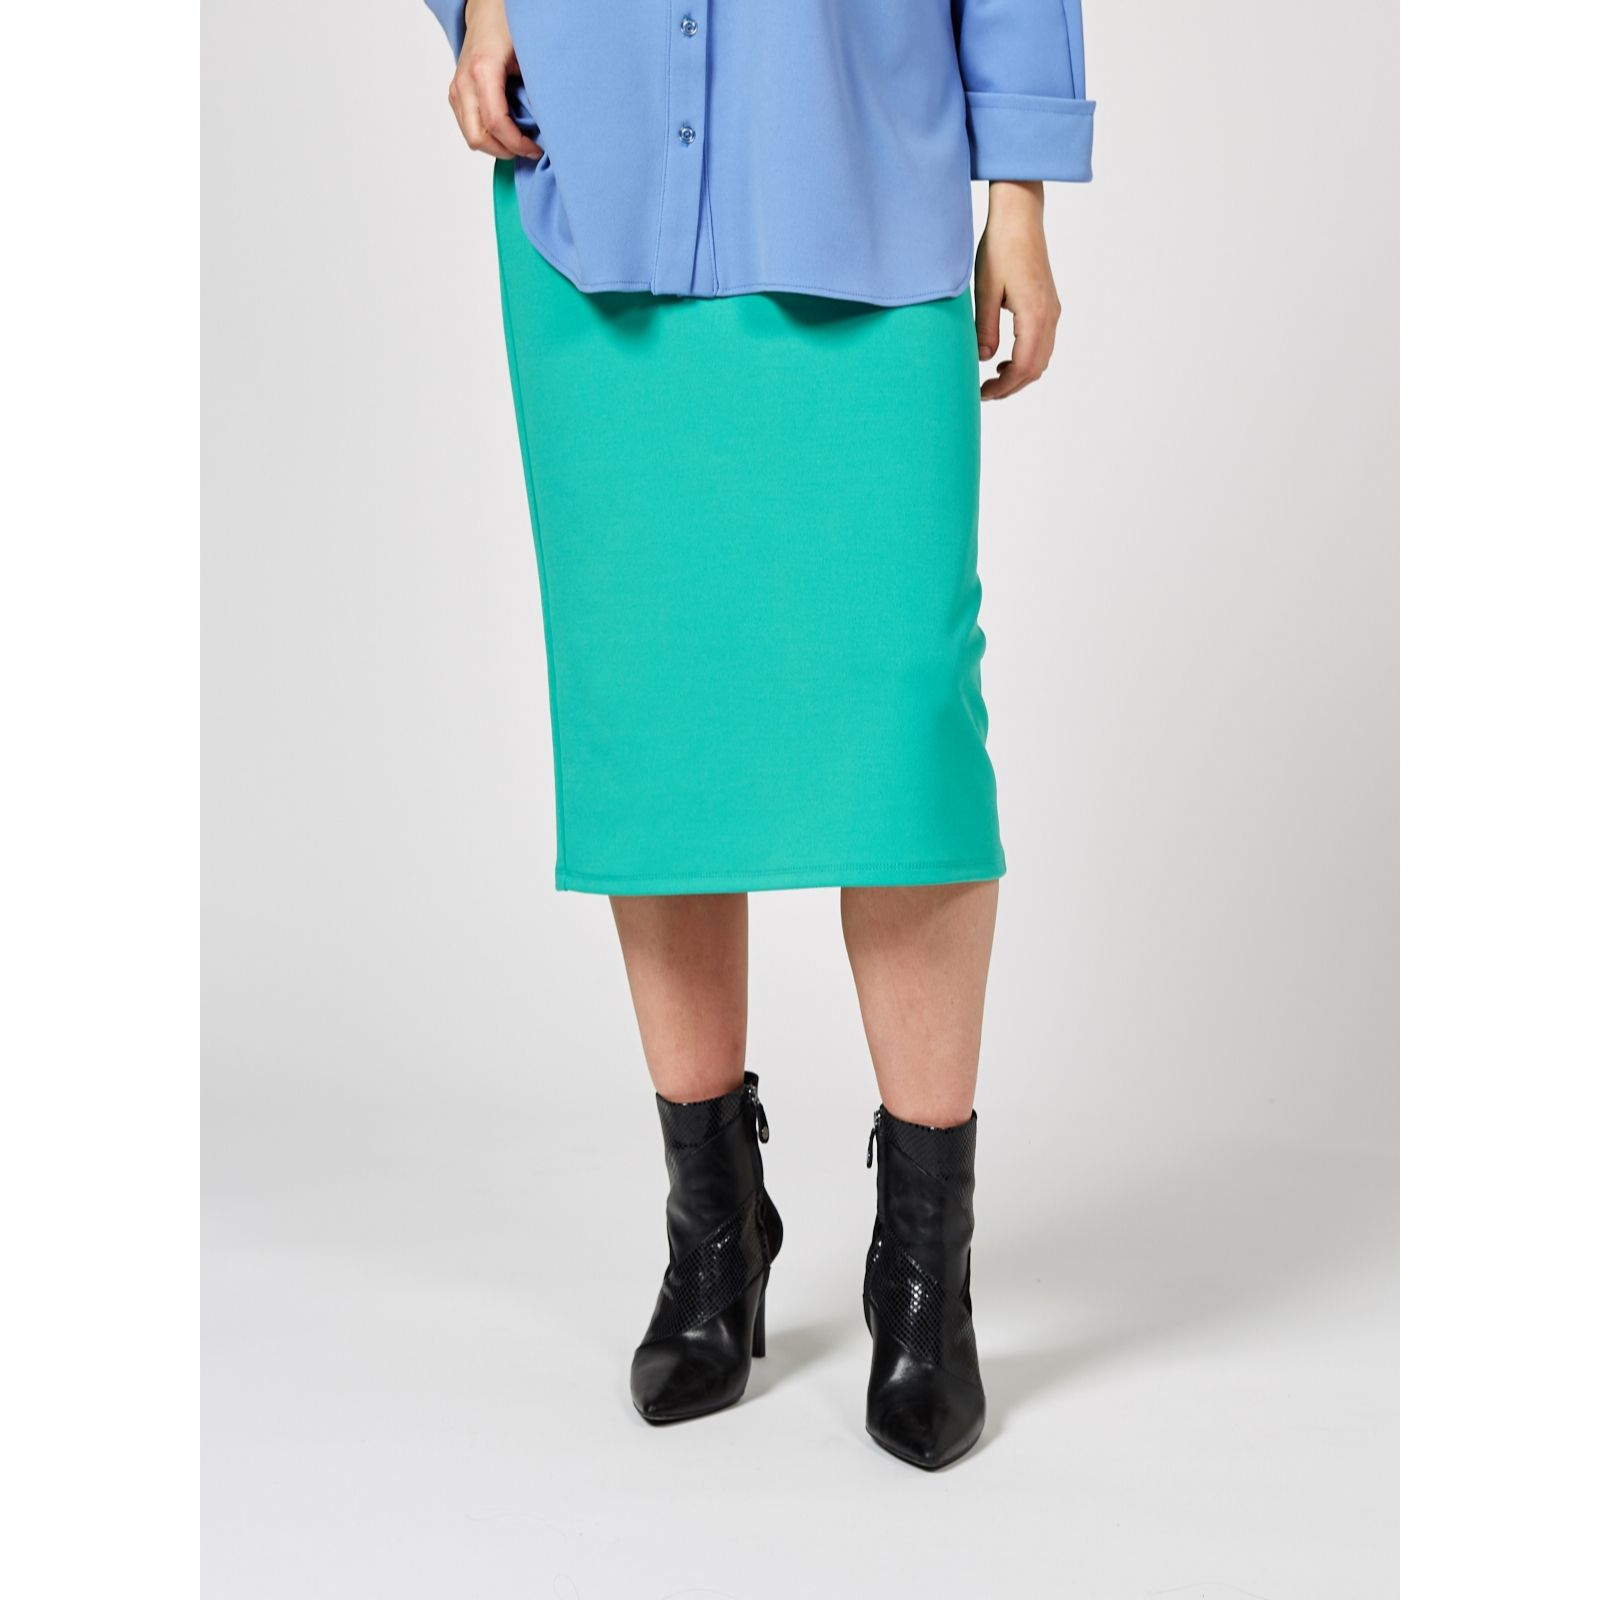 debe282ae5 Ben de Lisi Jersey Pencil Skirt - QVC UK